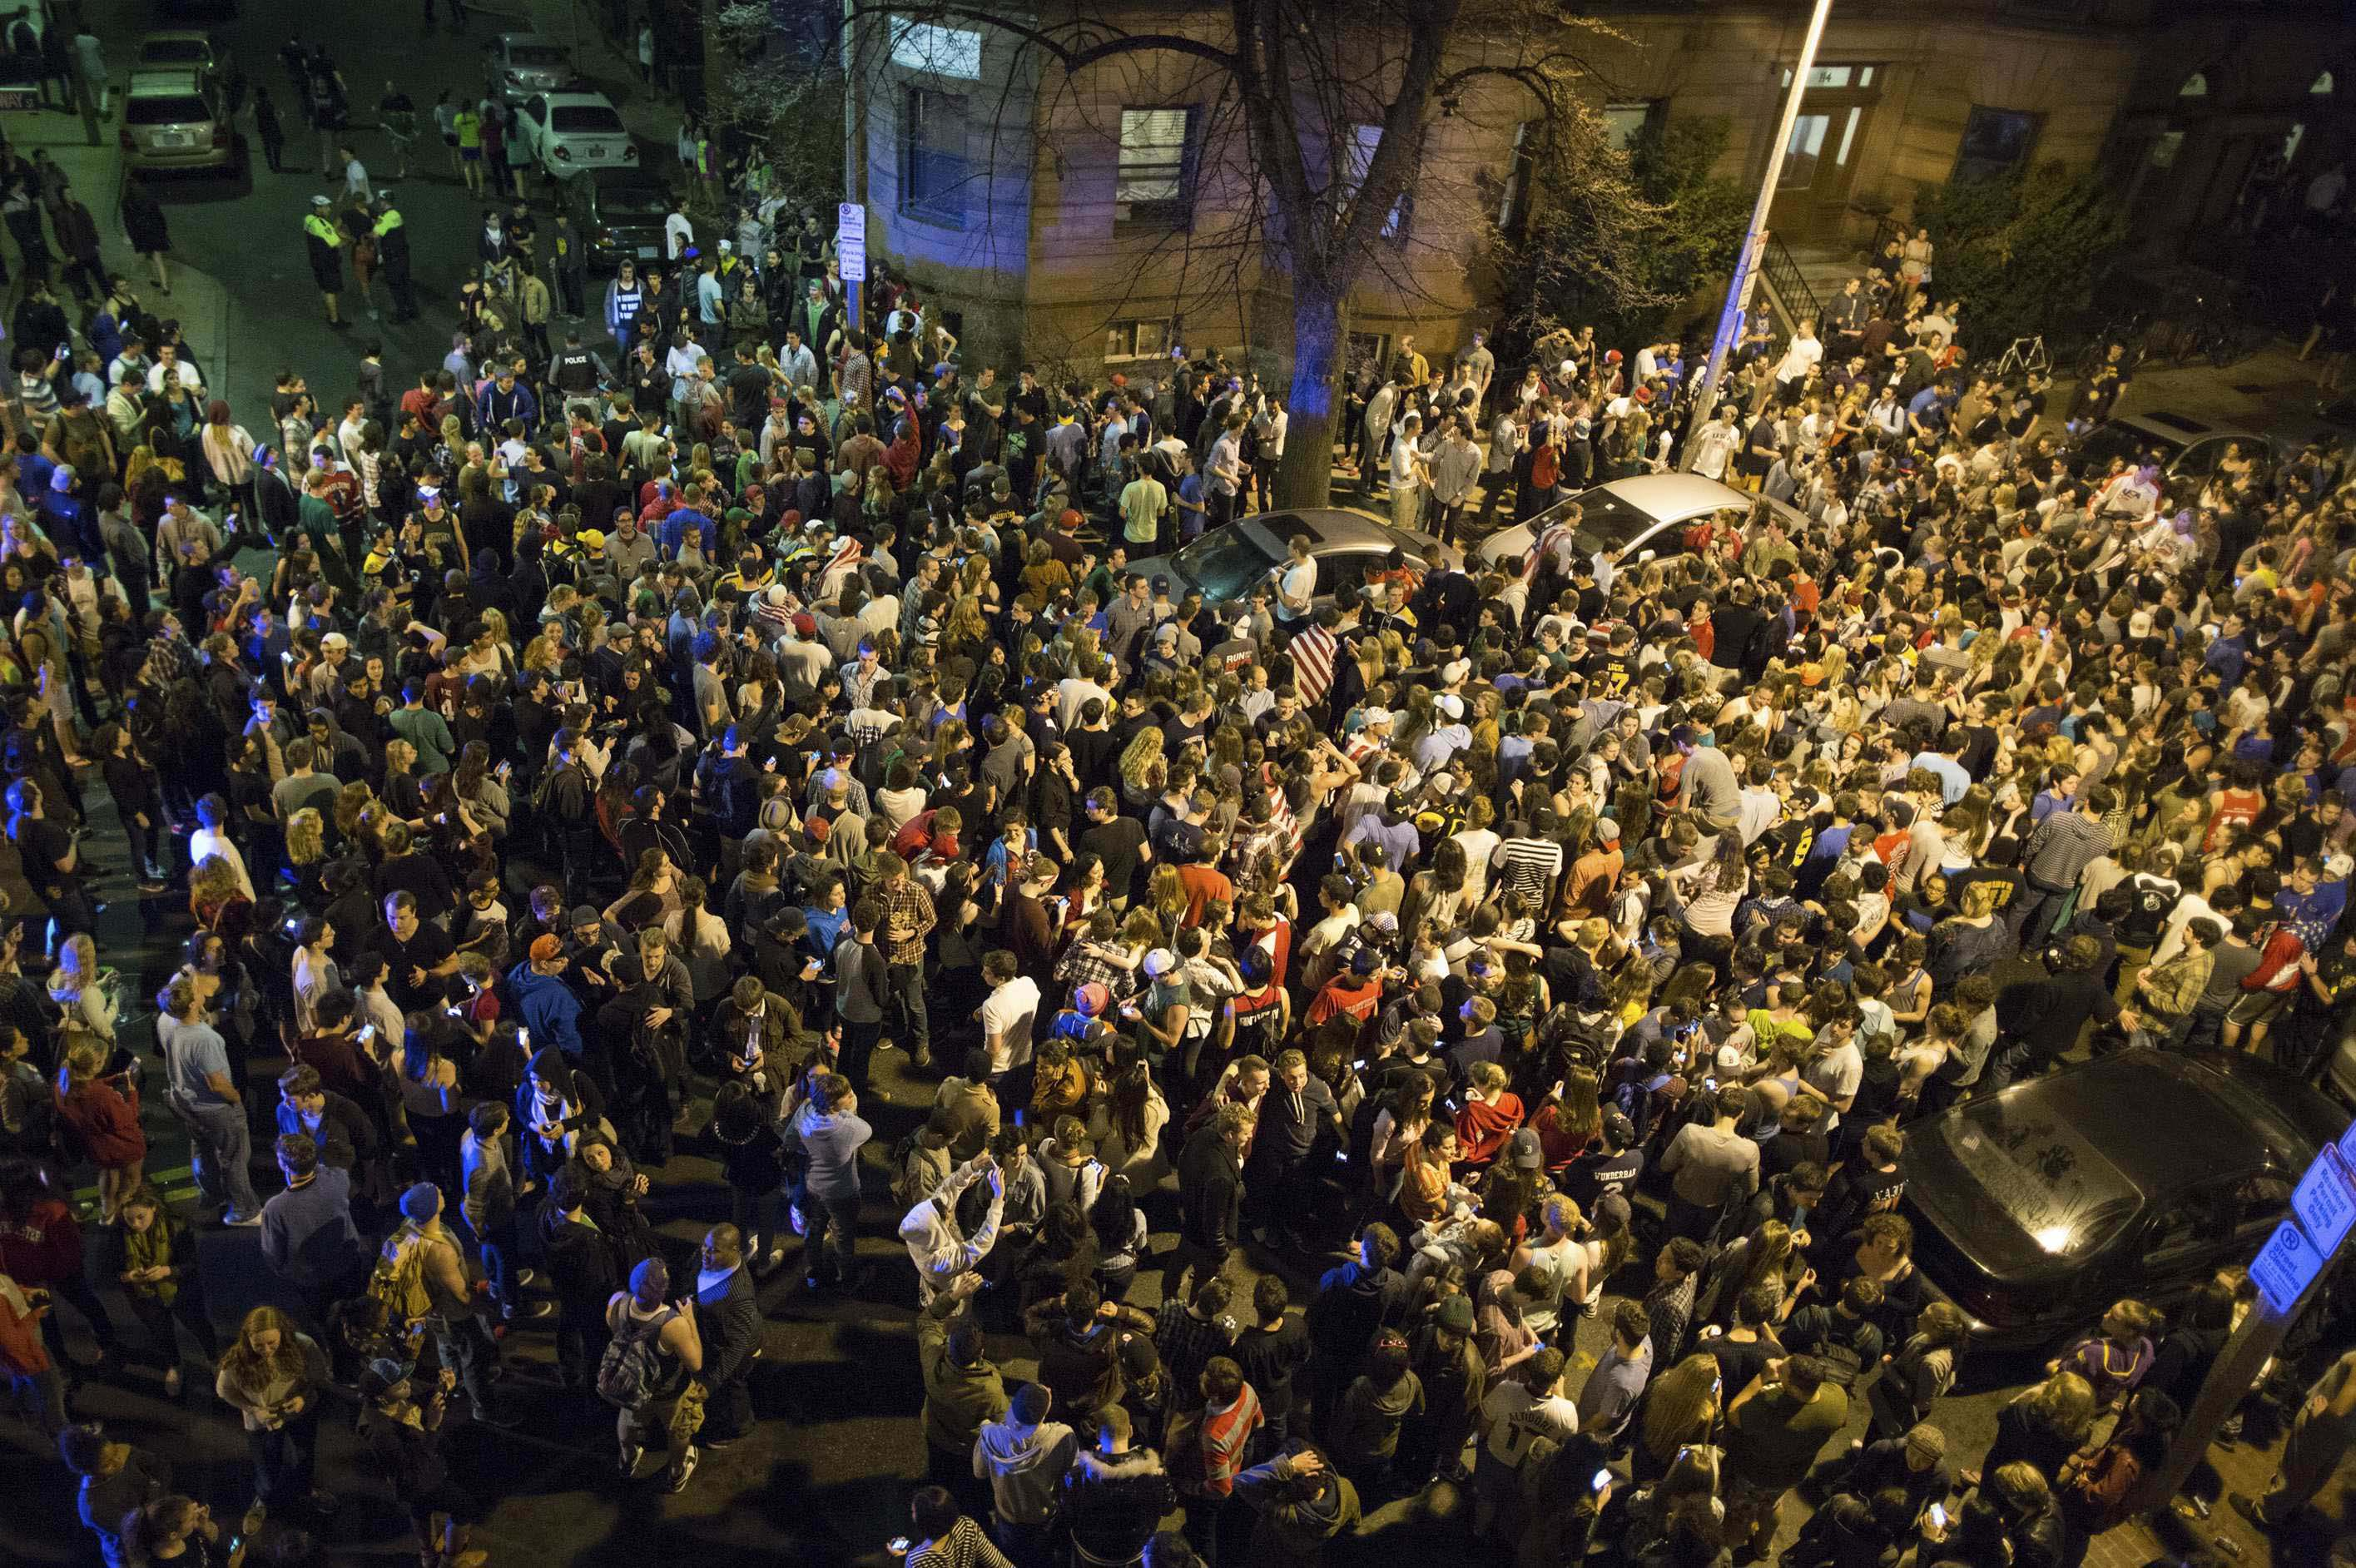 Boston manhunt concludes with capture of marathon bombing suspect